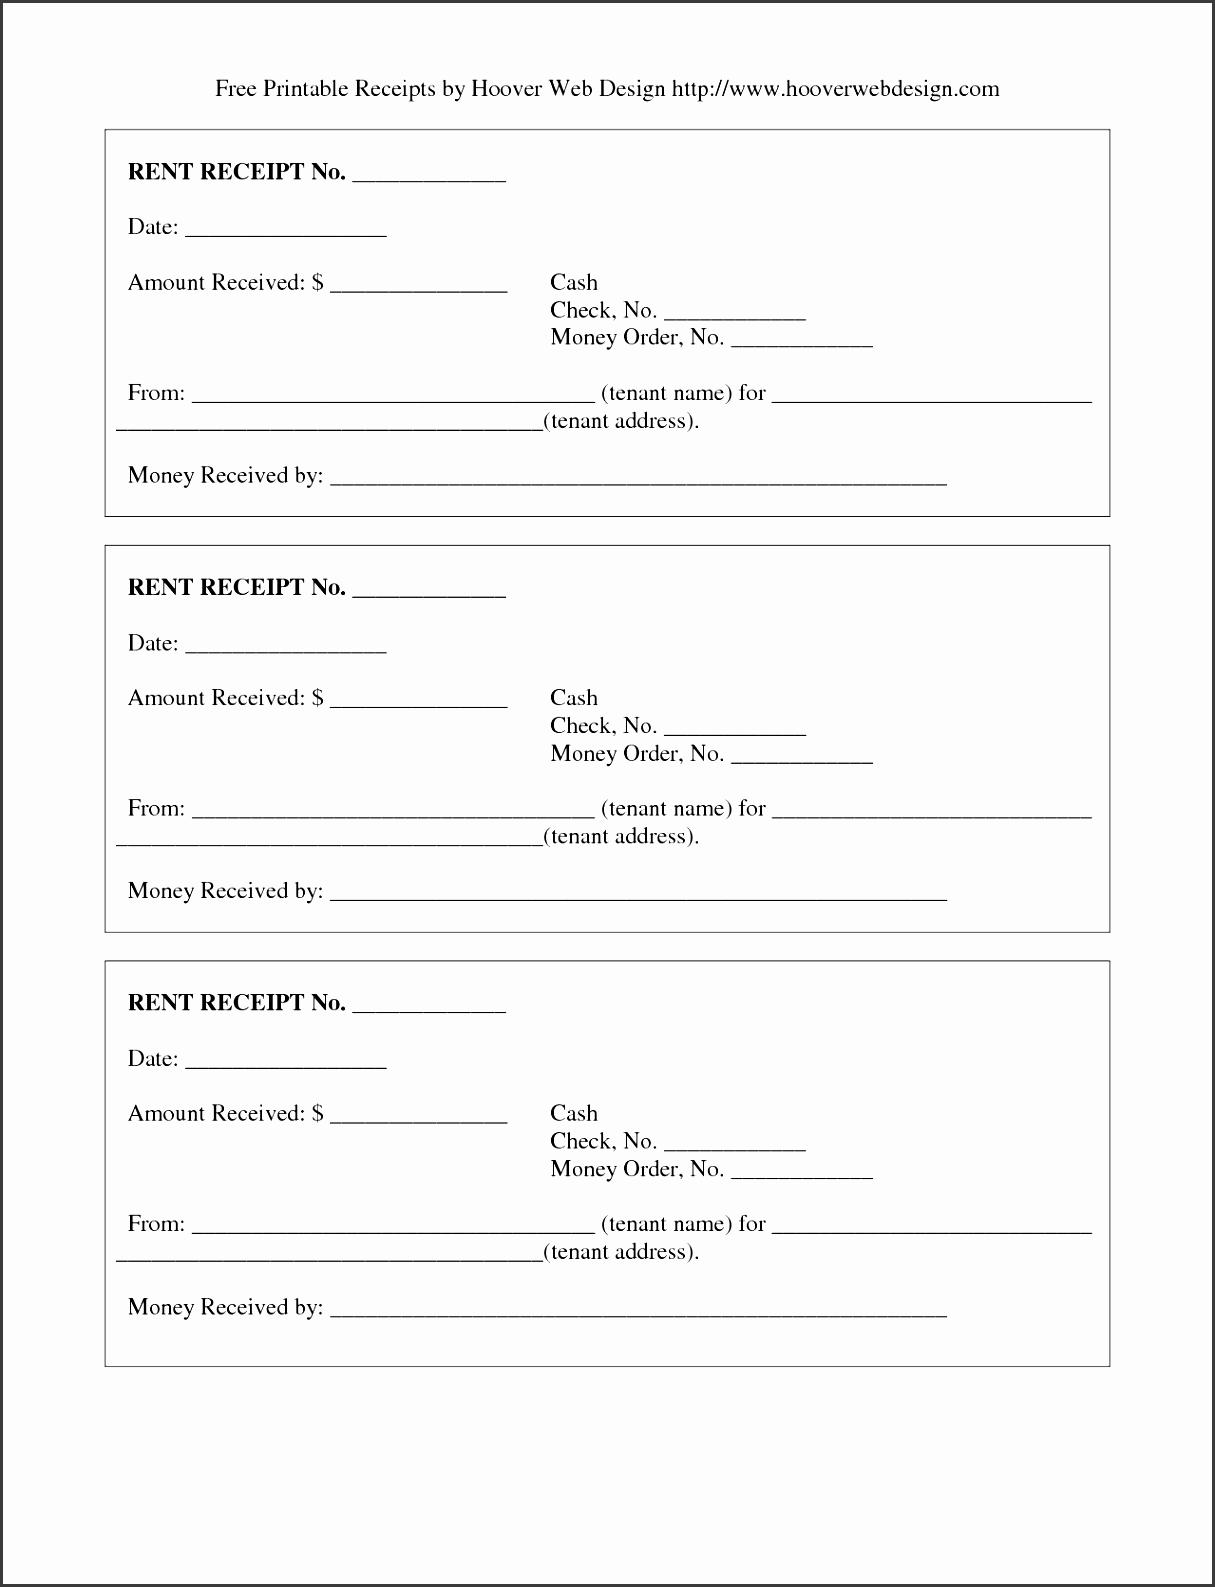 4 printable receipts printable receipt printable receipts 4 printable receipts room rental receipt room rental